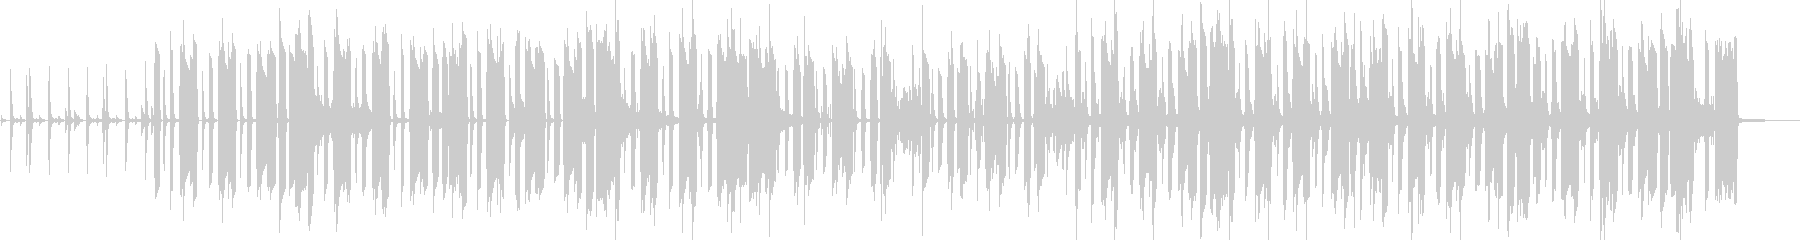 KANTジャジーでとぼけたBGMの未再生の波形